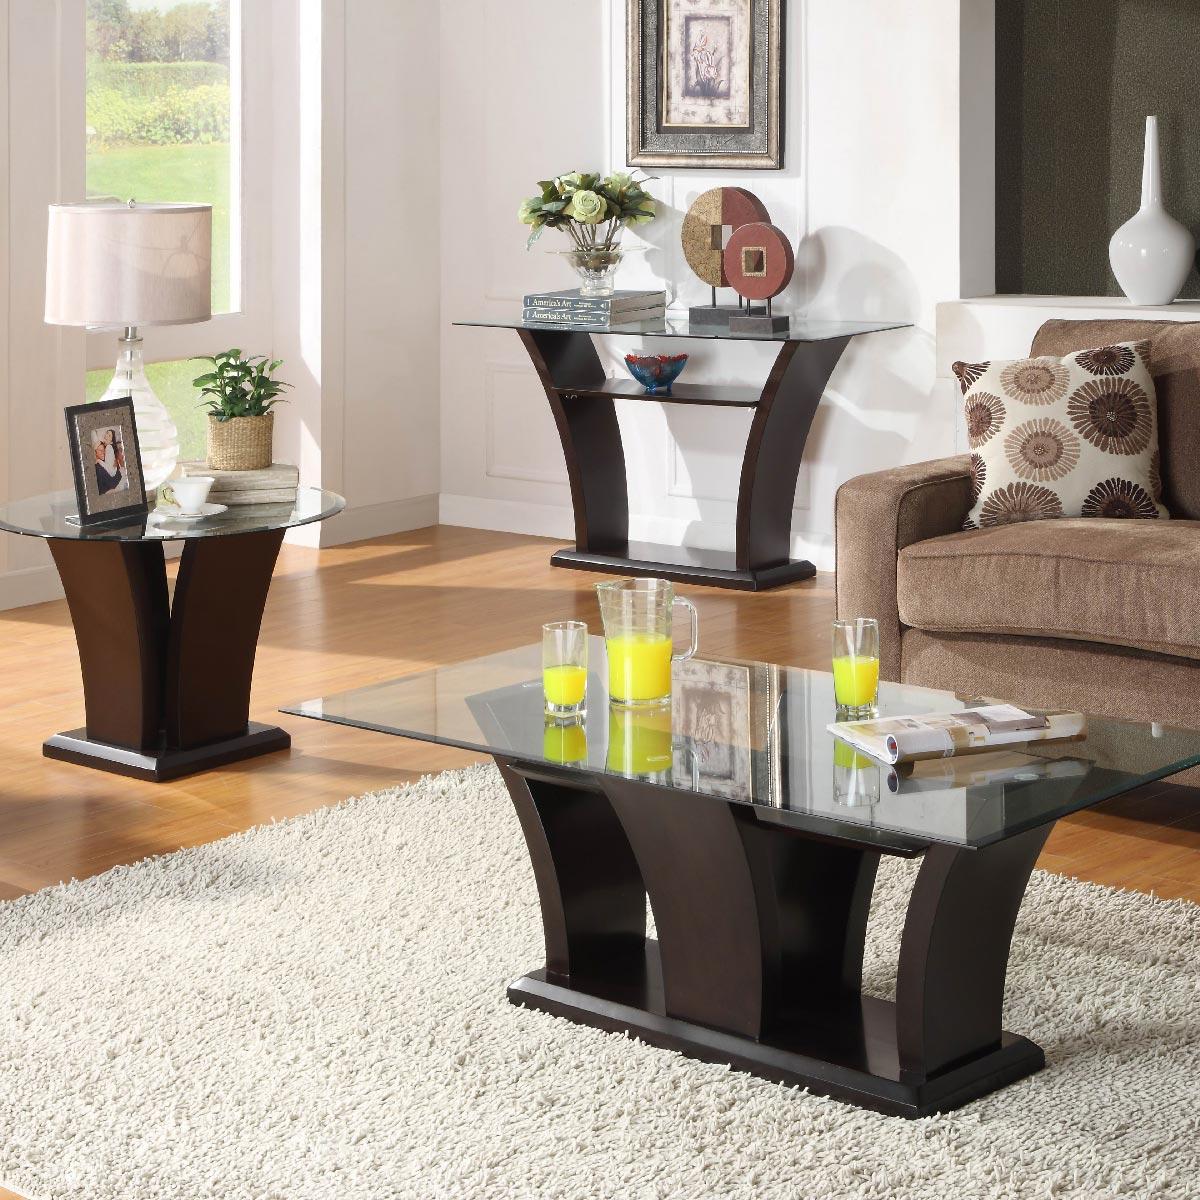 Rectangular Glass Top Dining Table - Decor Ideas